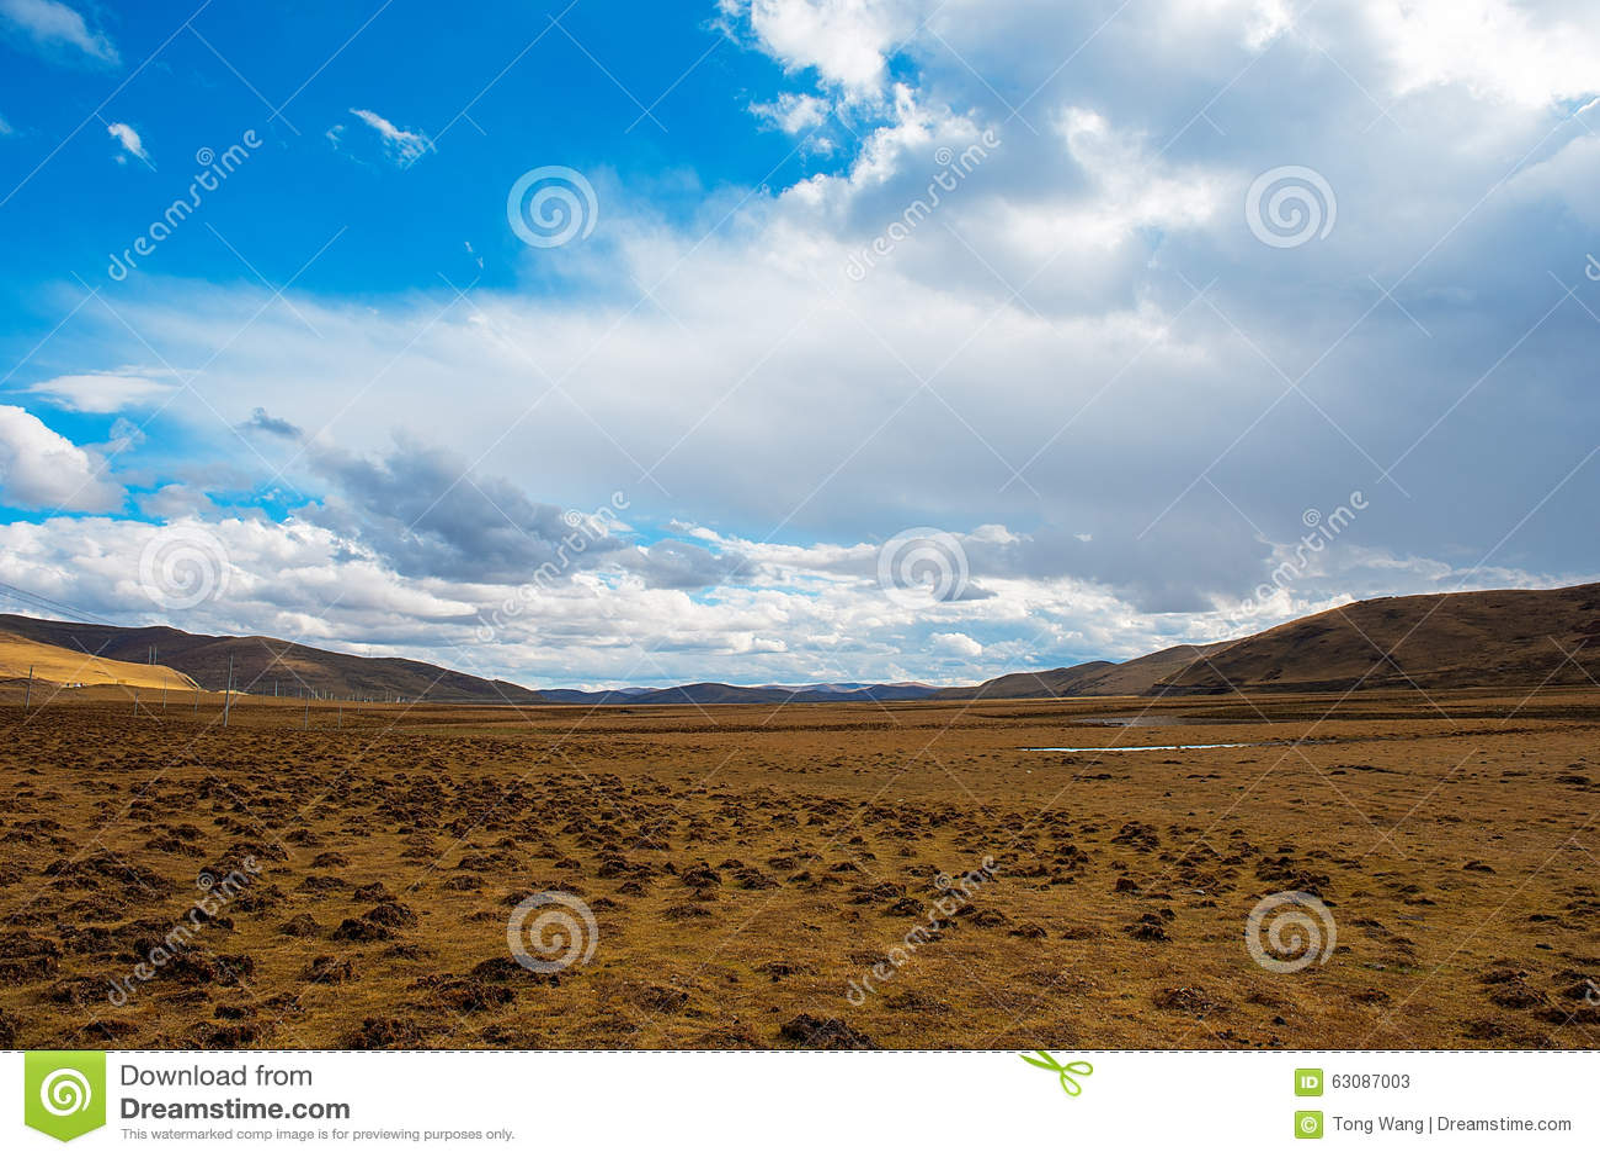 Golden grassland.